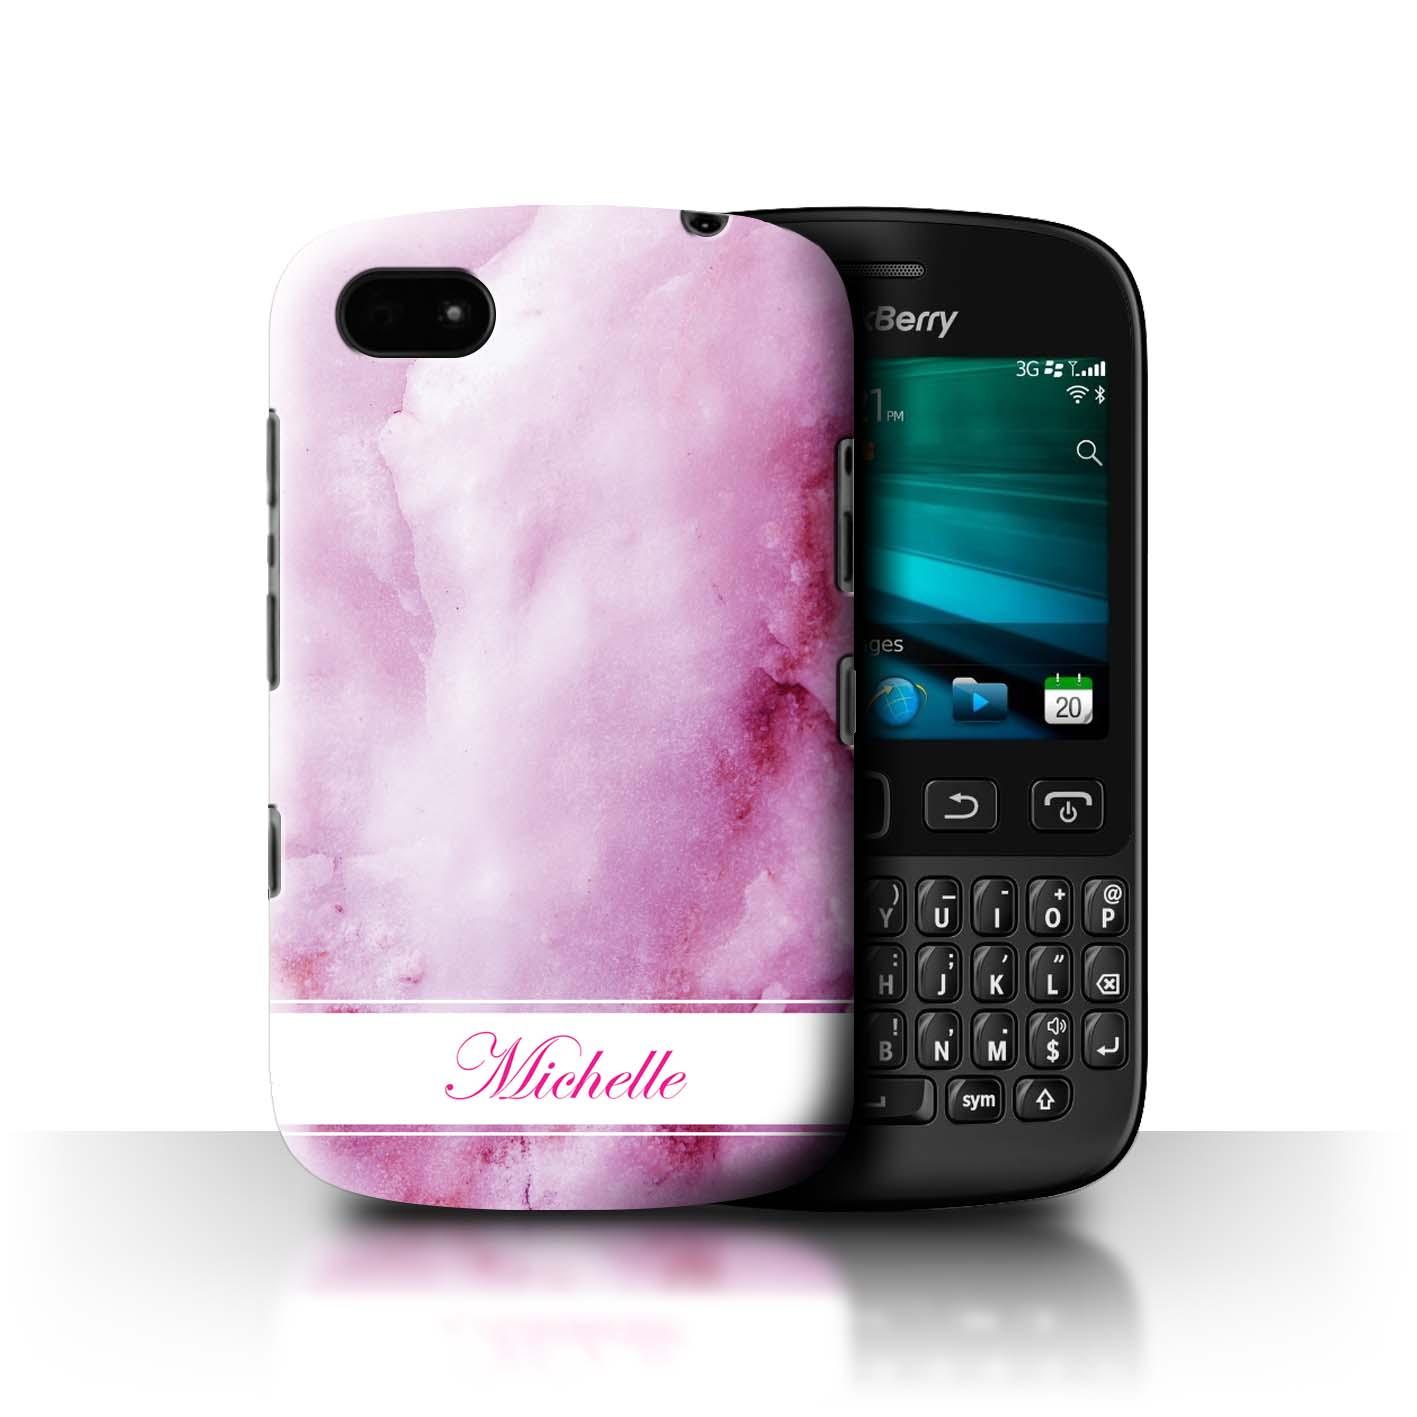 personnalise-Marbre-Coque-etui-pour-Blackberry-TelePhones-Initiale-Texte-Nom